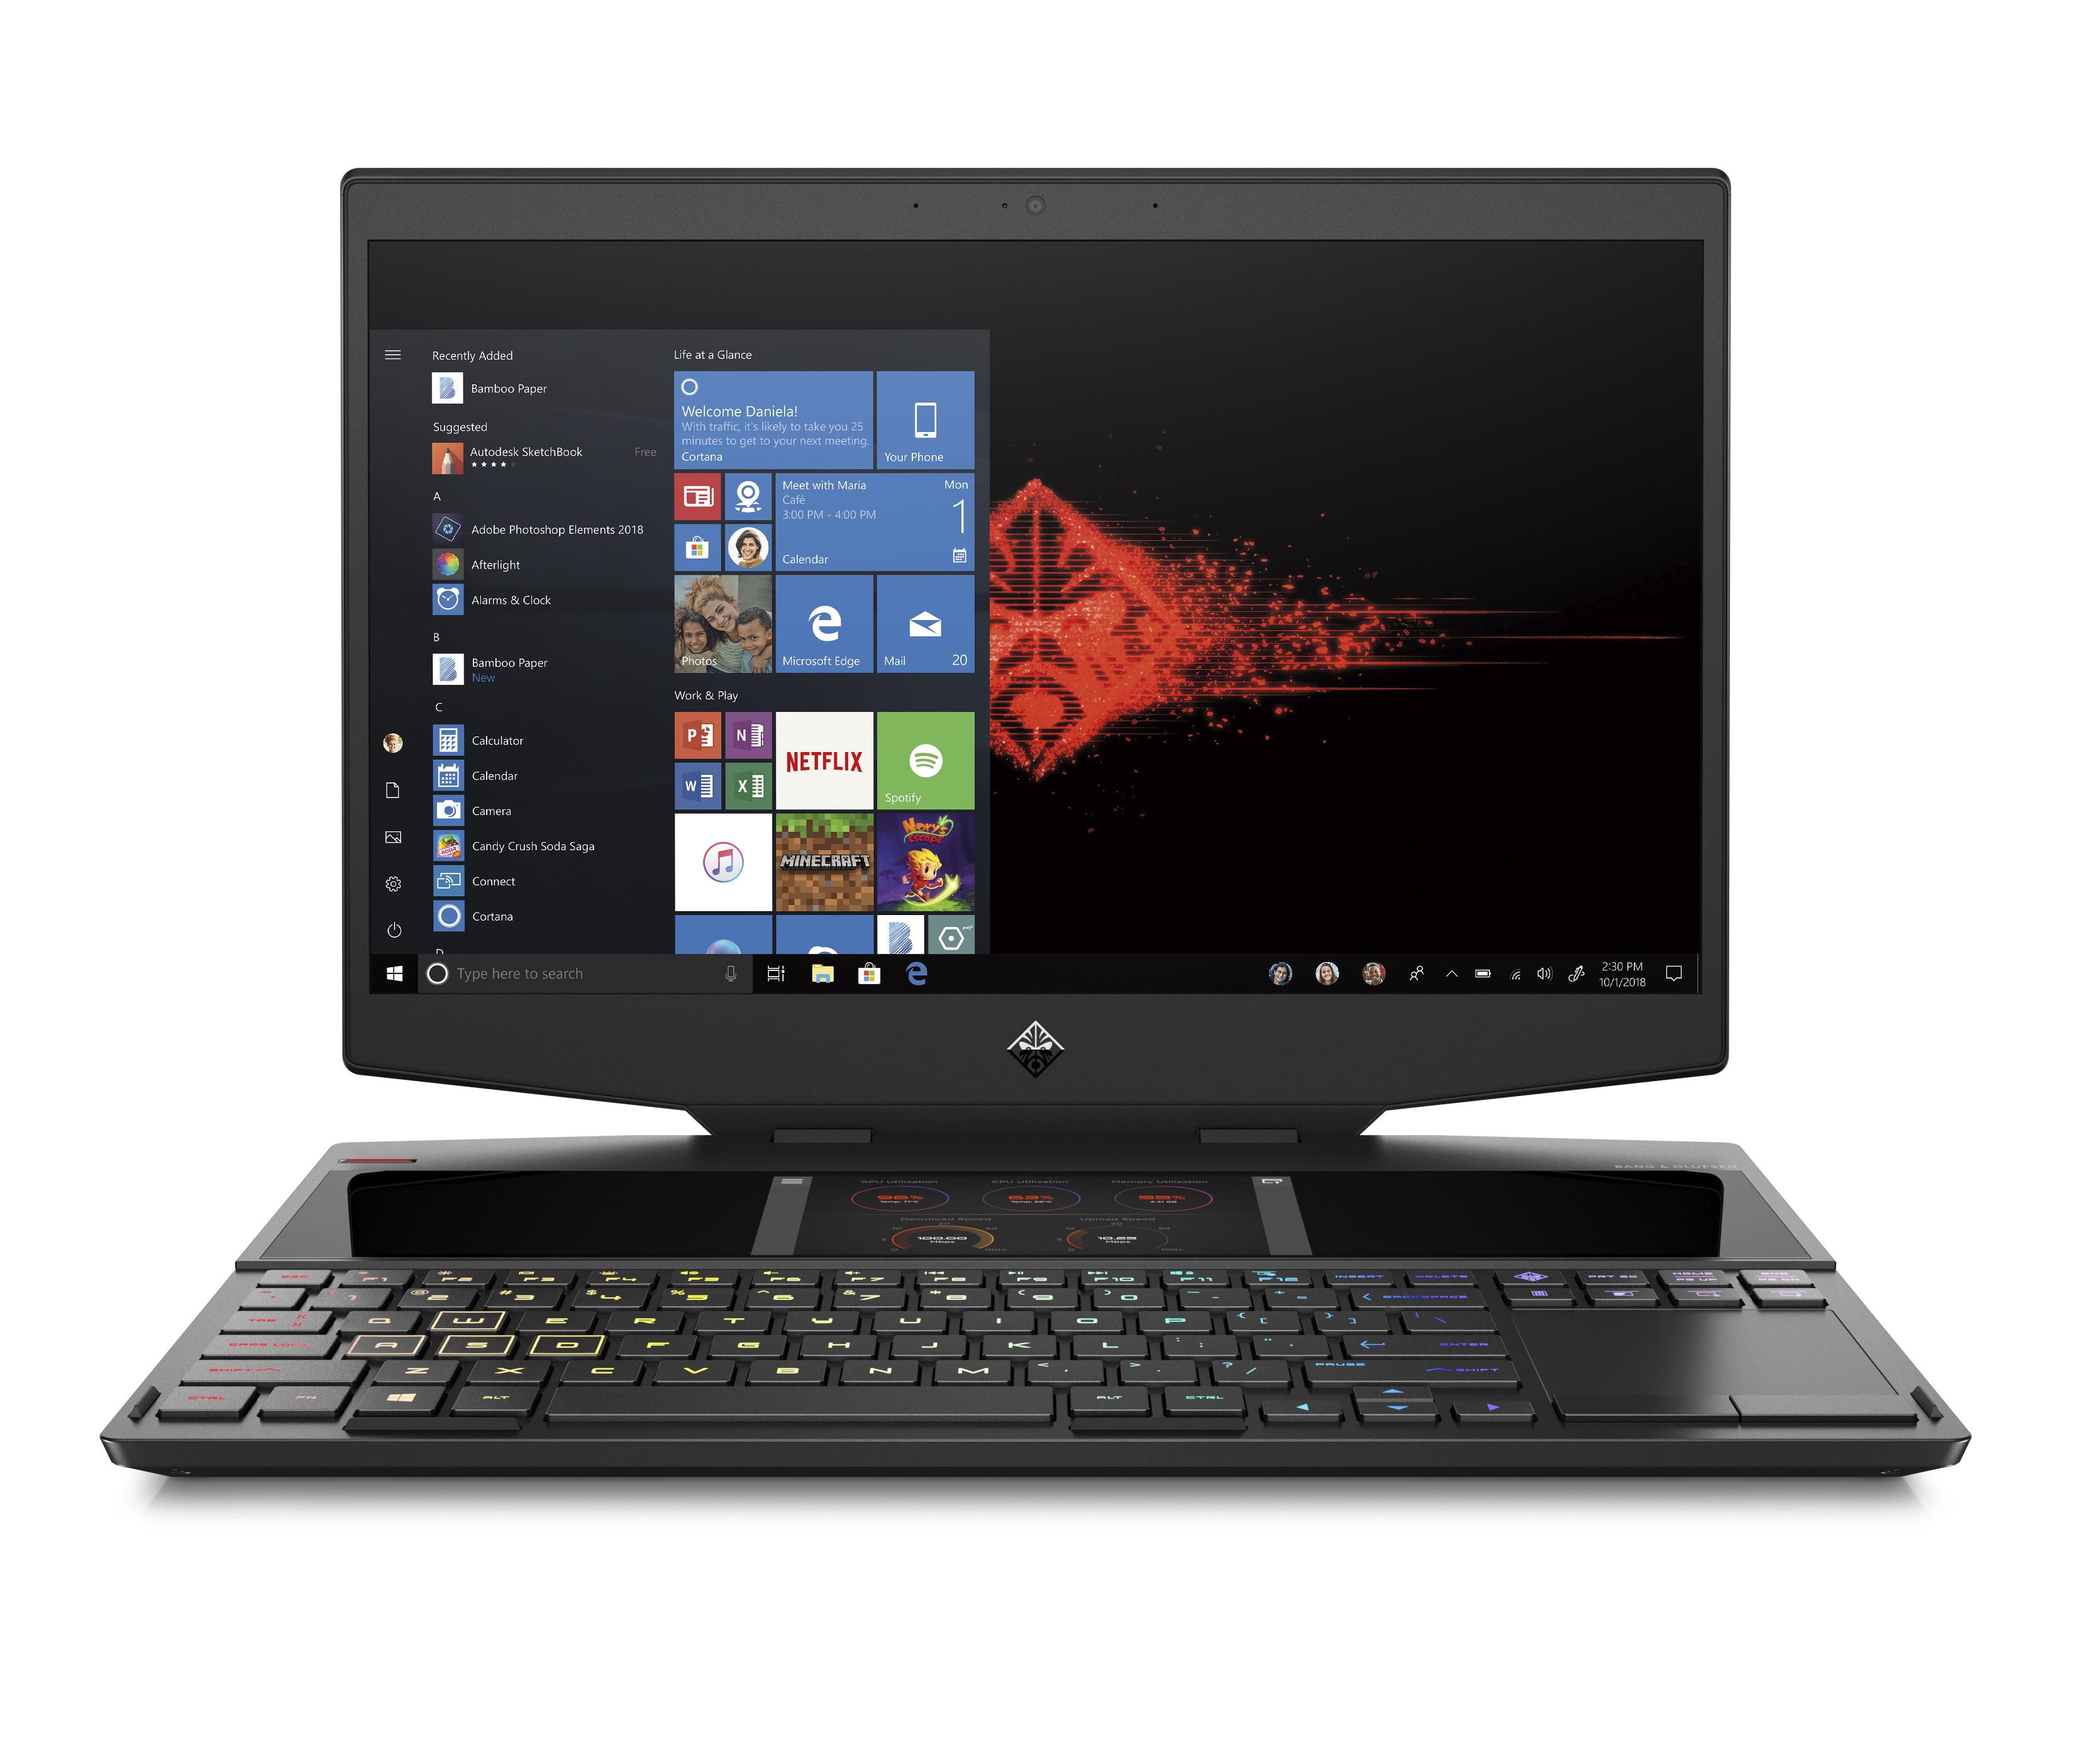 HP Omen X 2S 15-DG0020NR Laptop, 15.6'', Intel Core i7-9750H, NVIDIA GeForce RTX 2080 with Max-Q design, 1TB SSD Storage, 16GB RAM, 15-DG0020NR